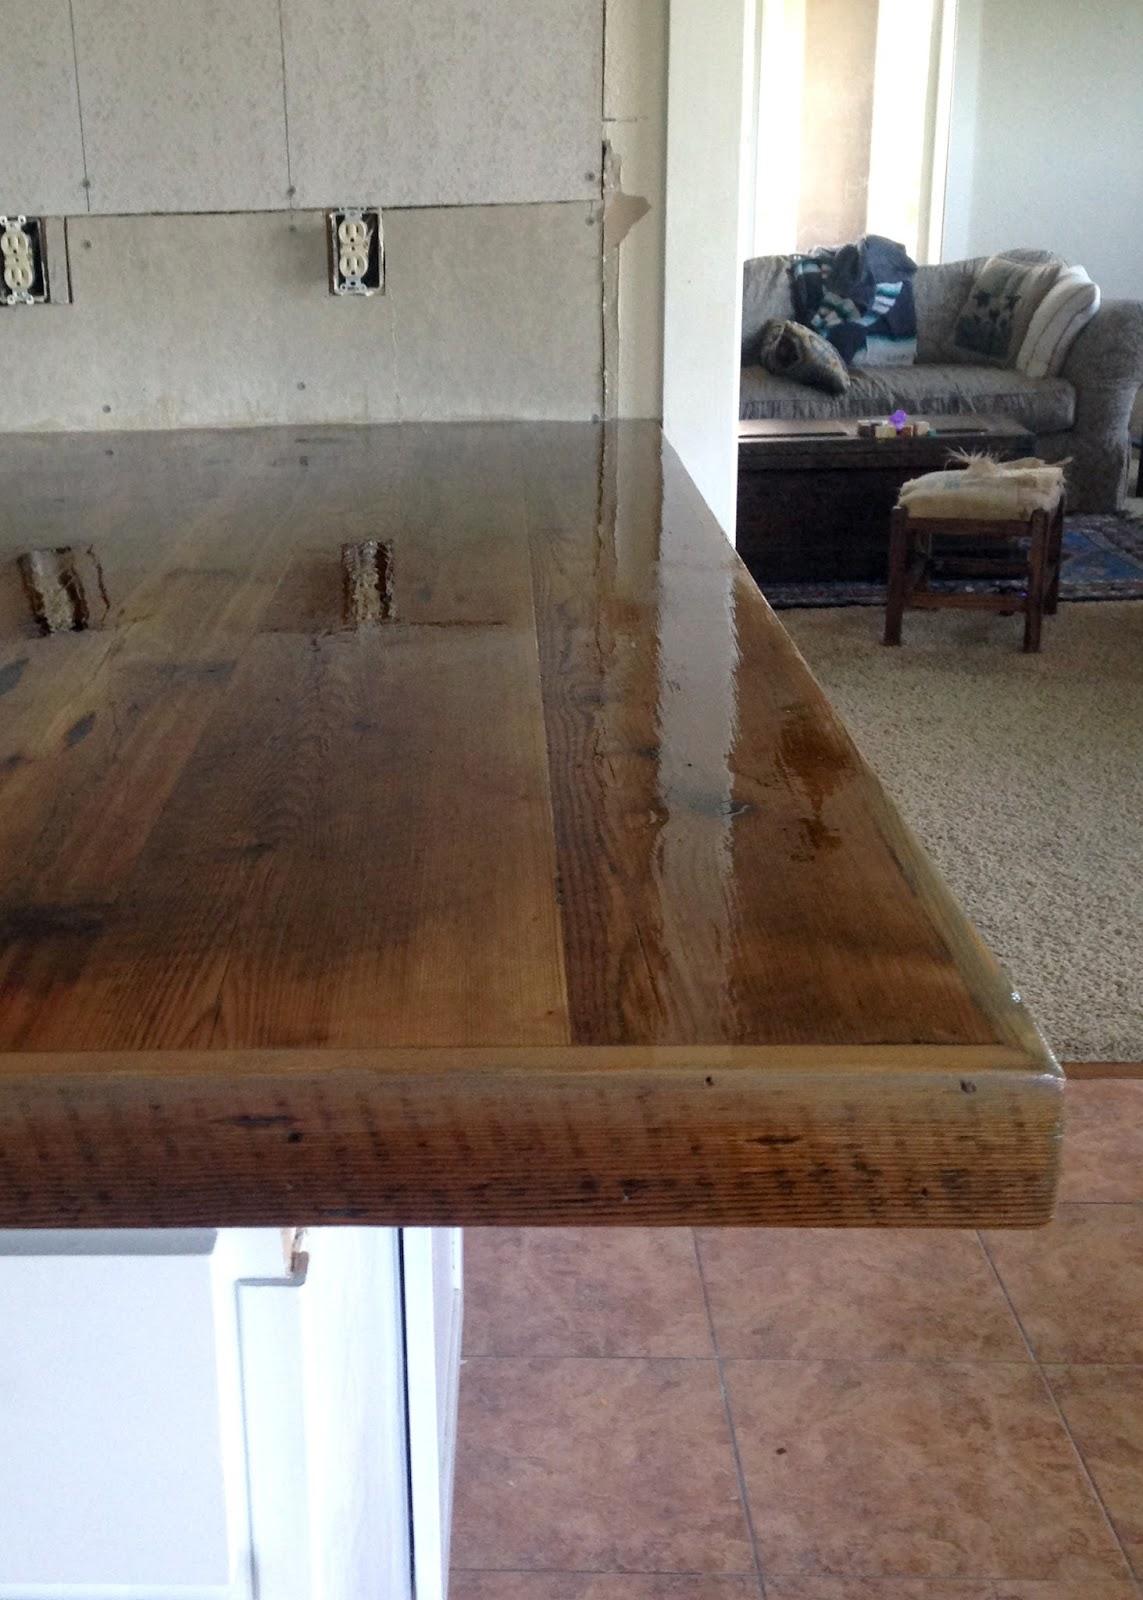 DIY Reclaimed Wood Countertop | Averie Lane: DIY Reclaimed ...